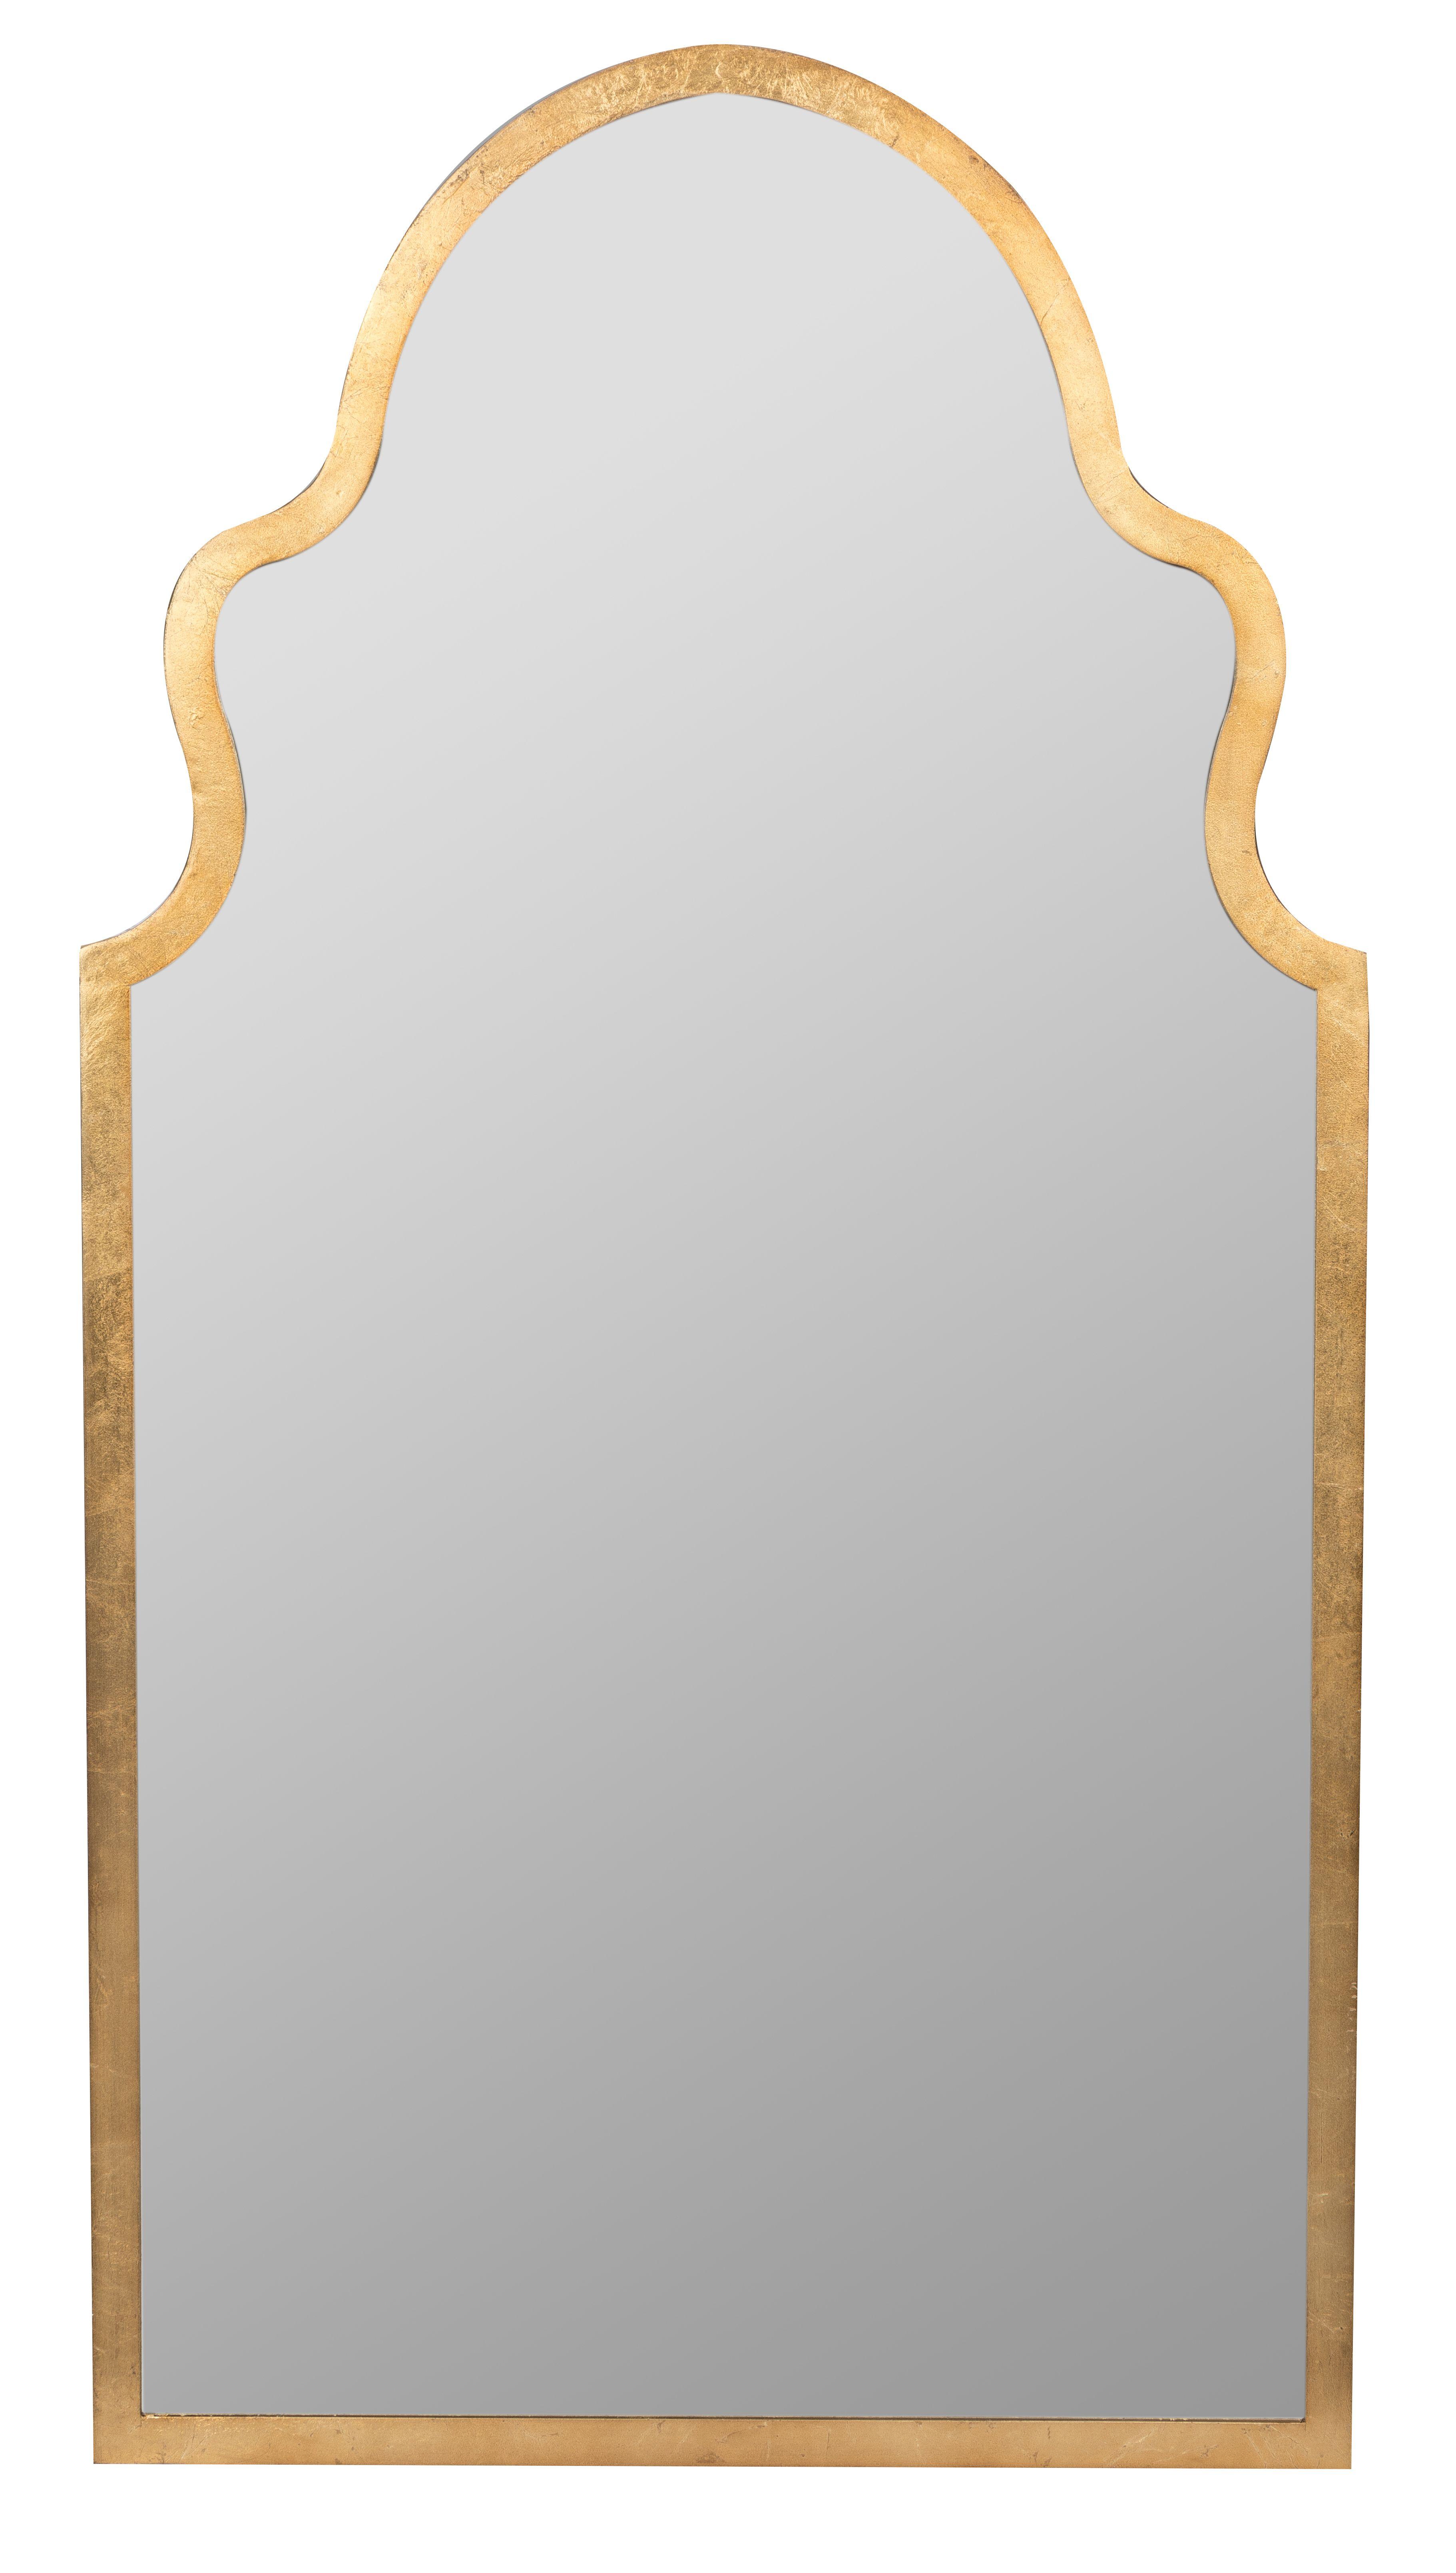 Lincoln Mirror in 2020 | Gold vanity mirror, Hallway ...